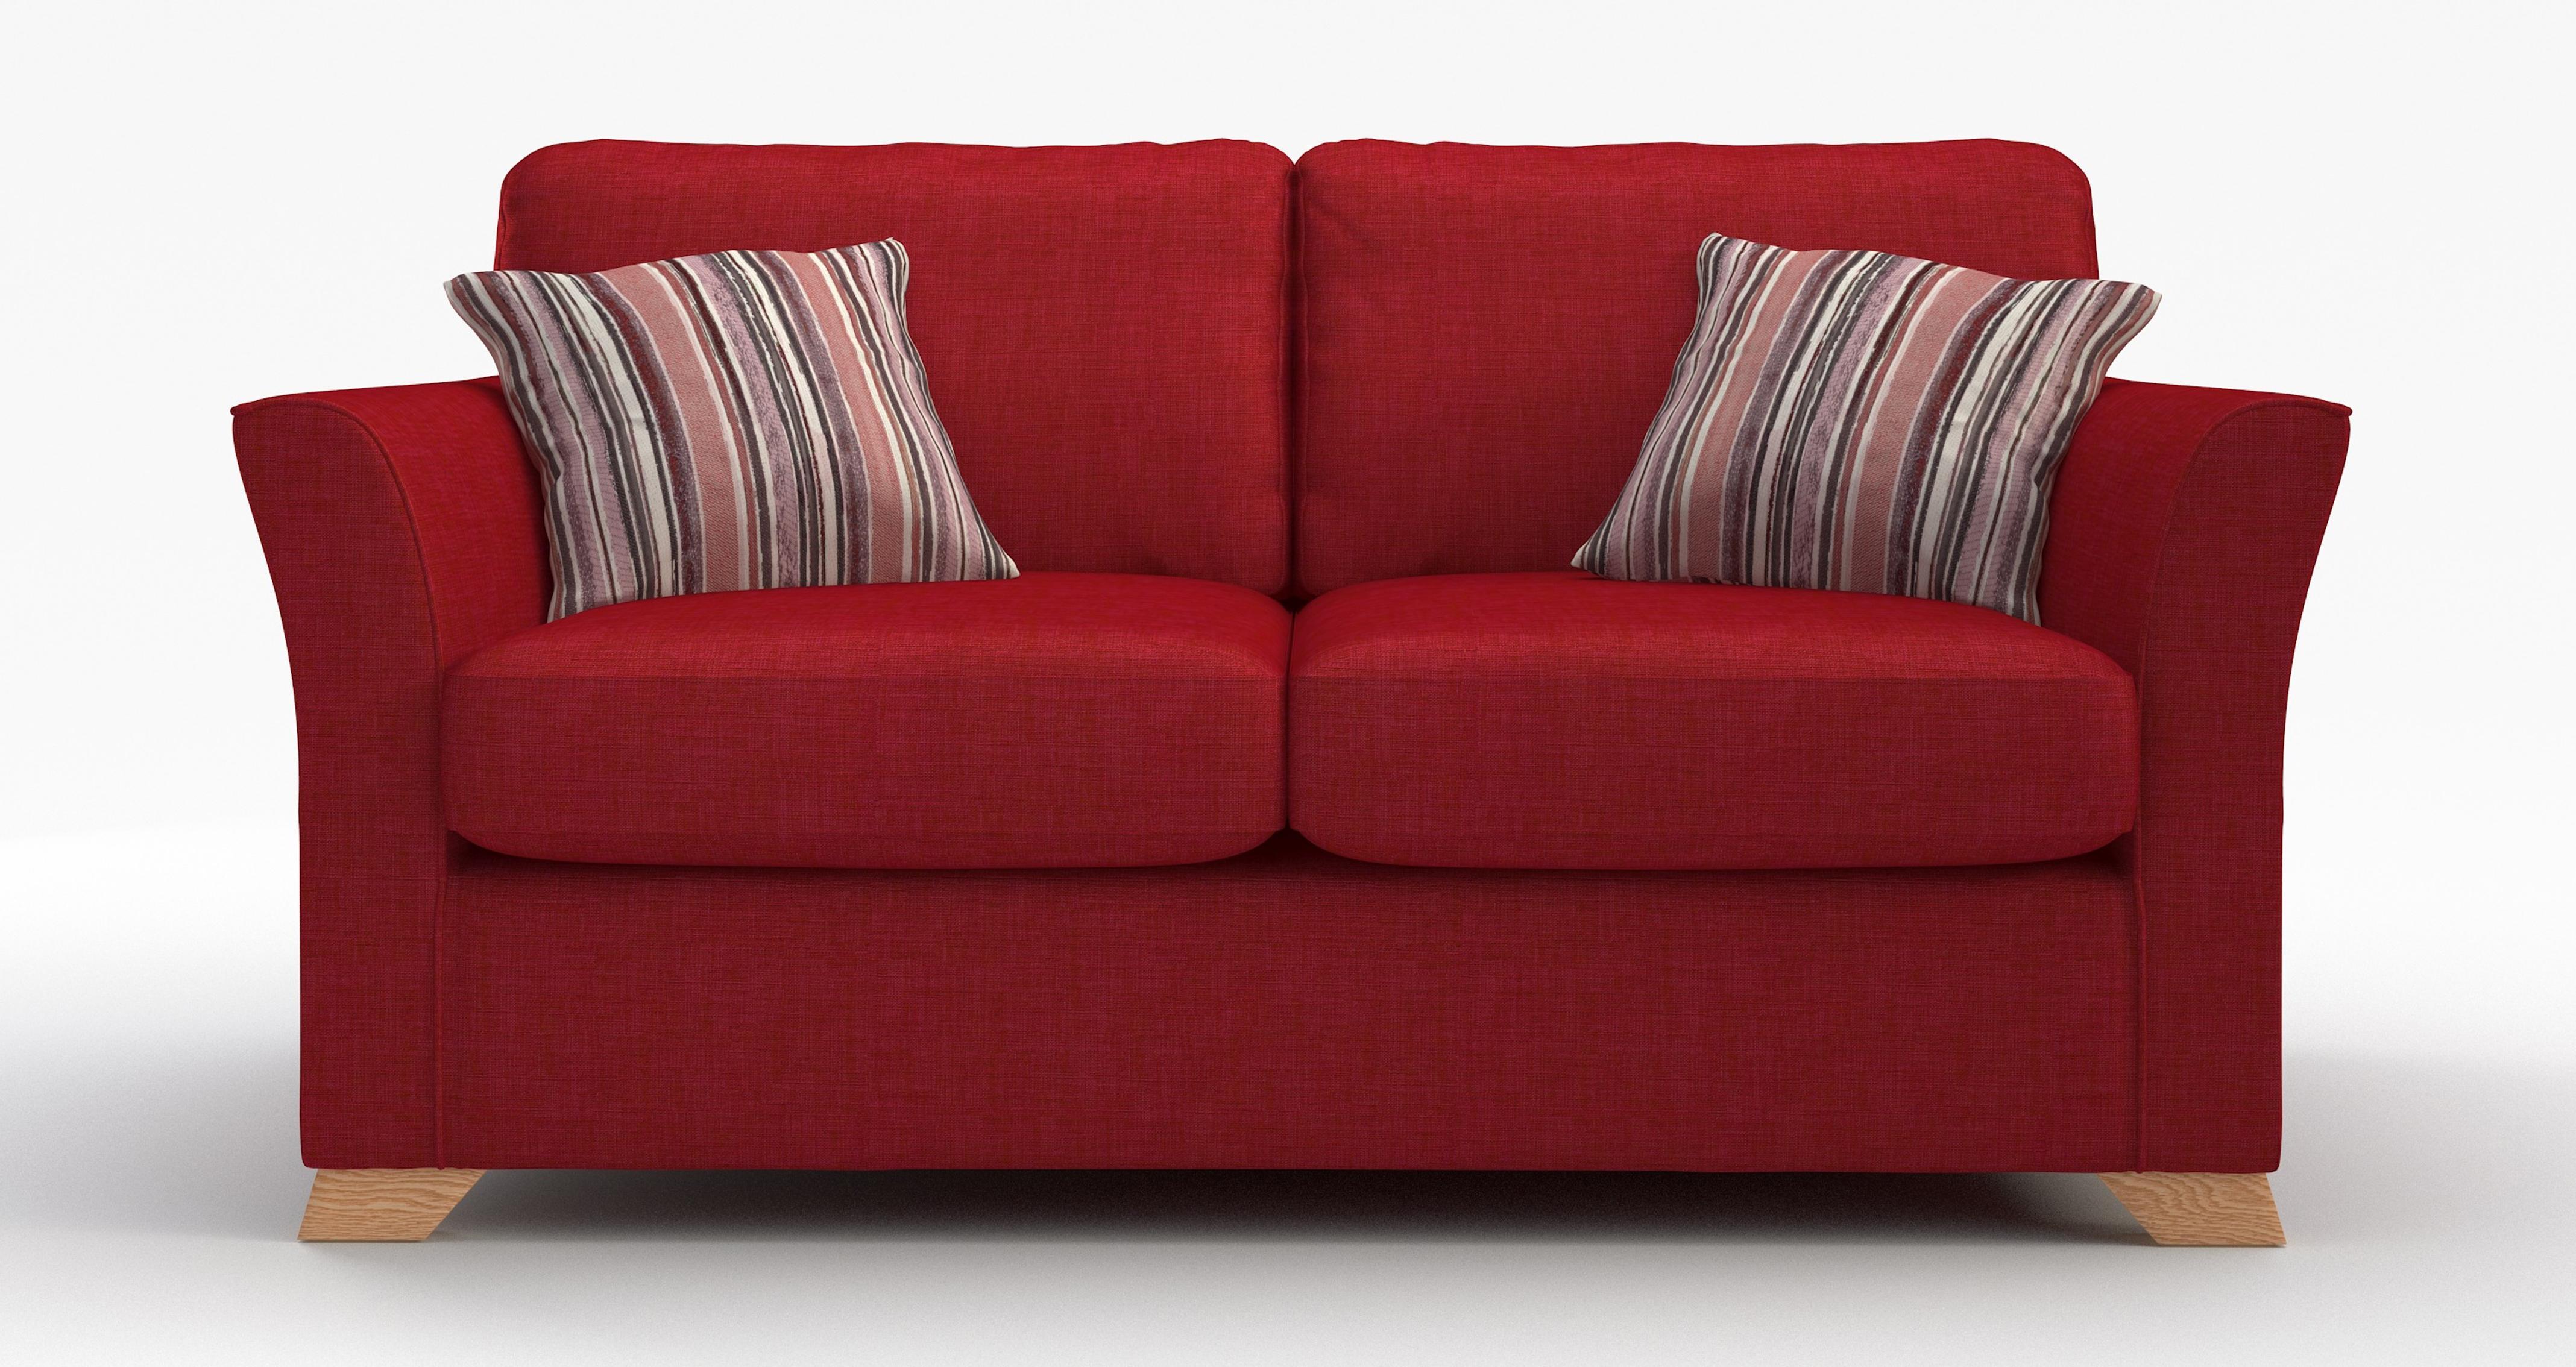 DFS Zuma Red Fabric Range - 3 Seater, 2 Str, Sofa Bed ...